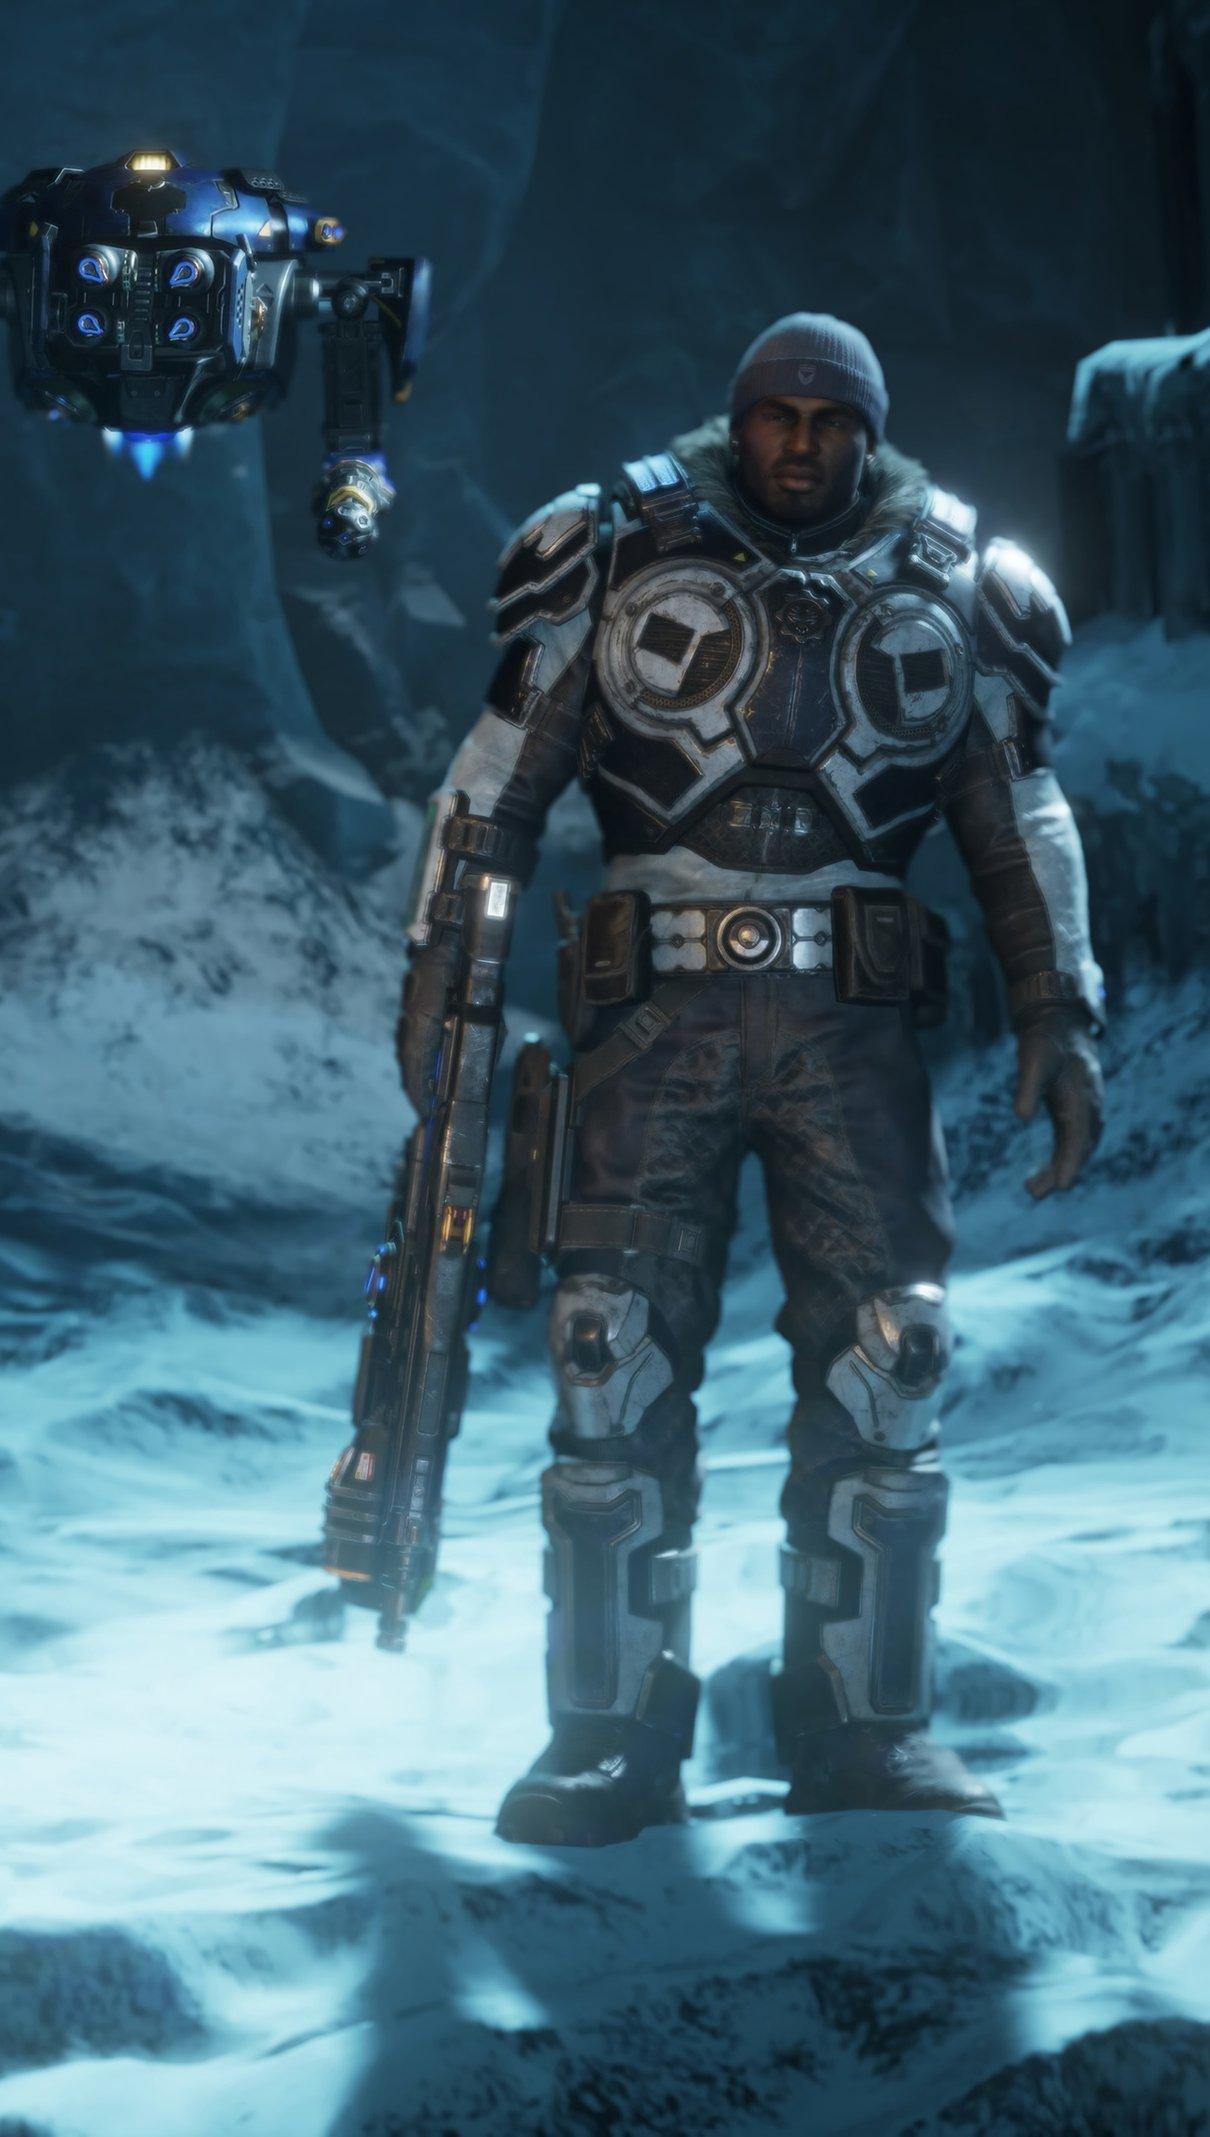 Fondos de pantalla Personajes de Gears of War 5 Vertical